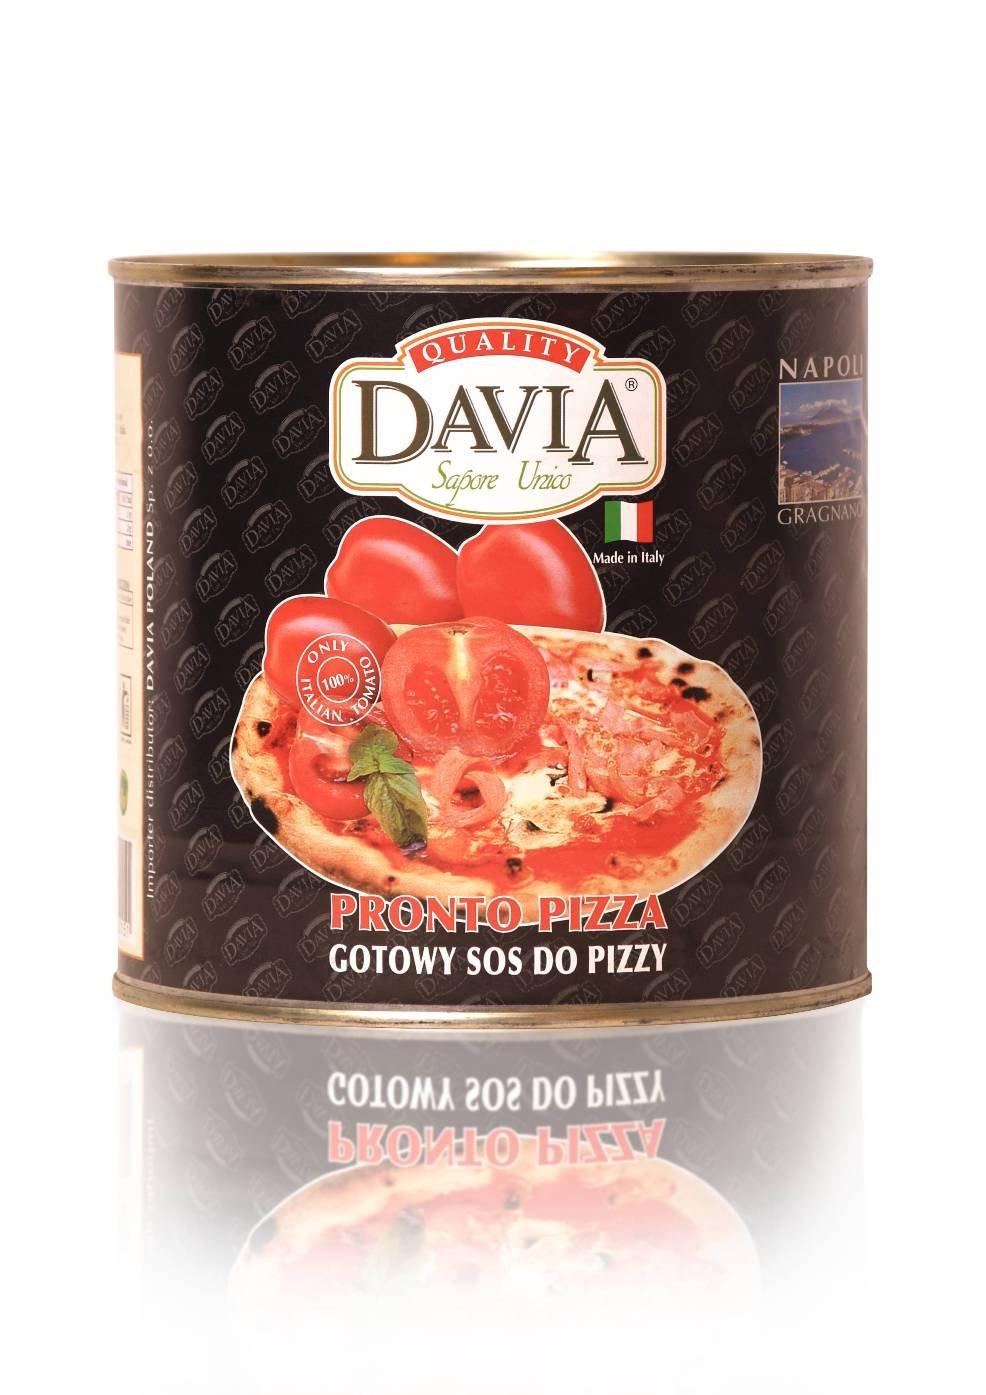 Pizza sauce from Poland Poland , Pizza sauce manufactory Davia Srl